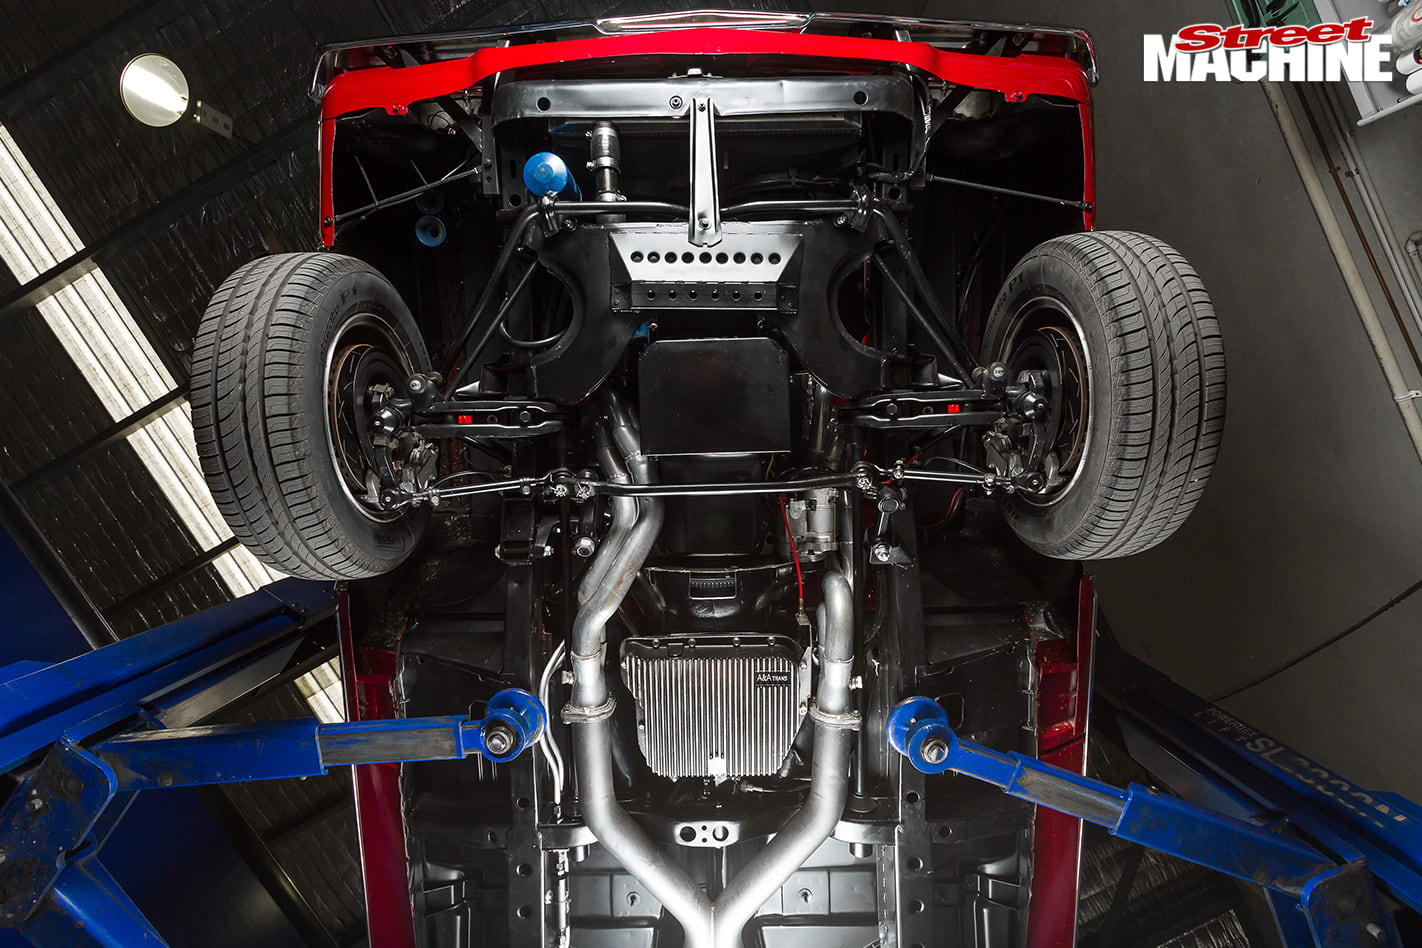 Chrysler -cl -charger -under -4